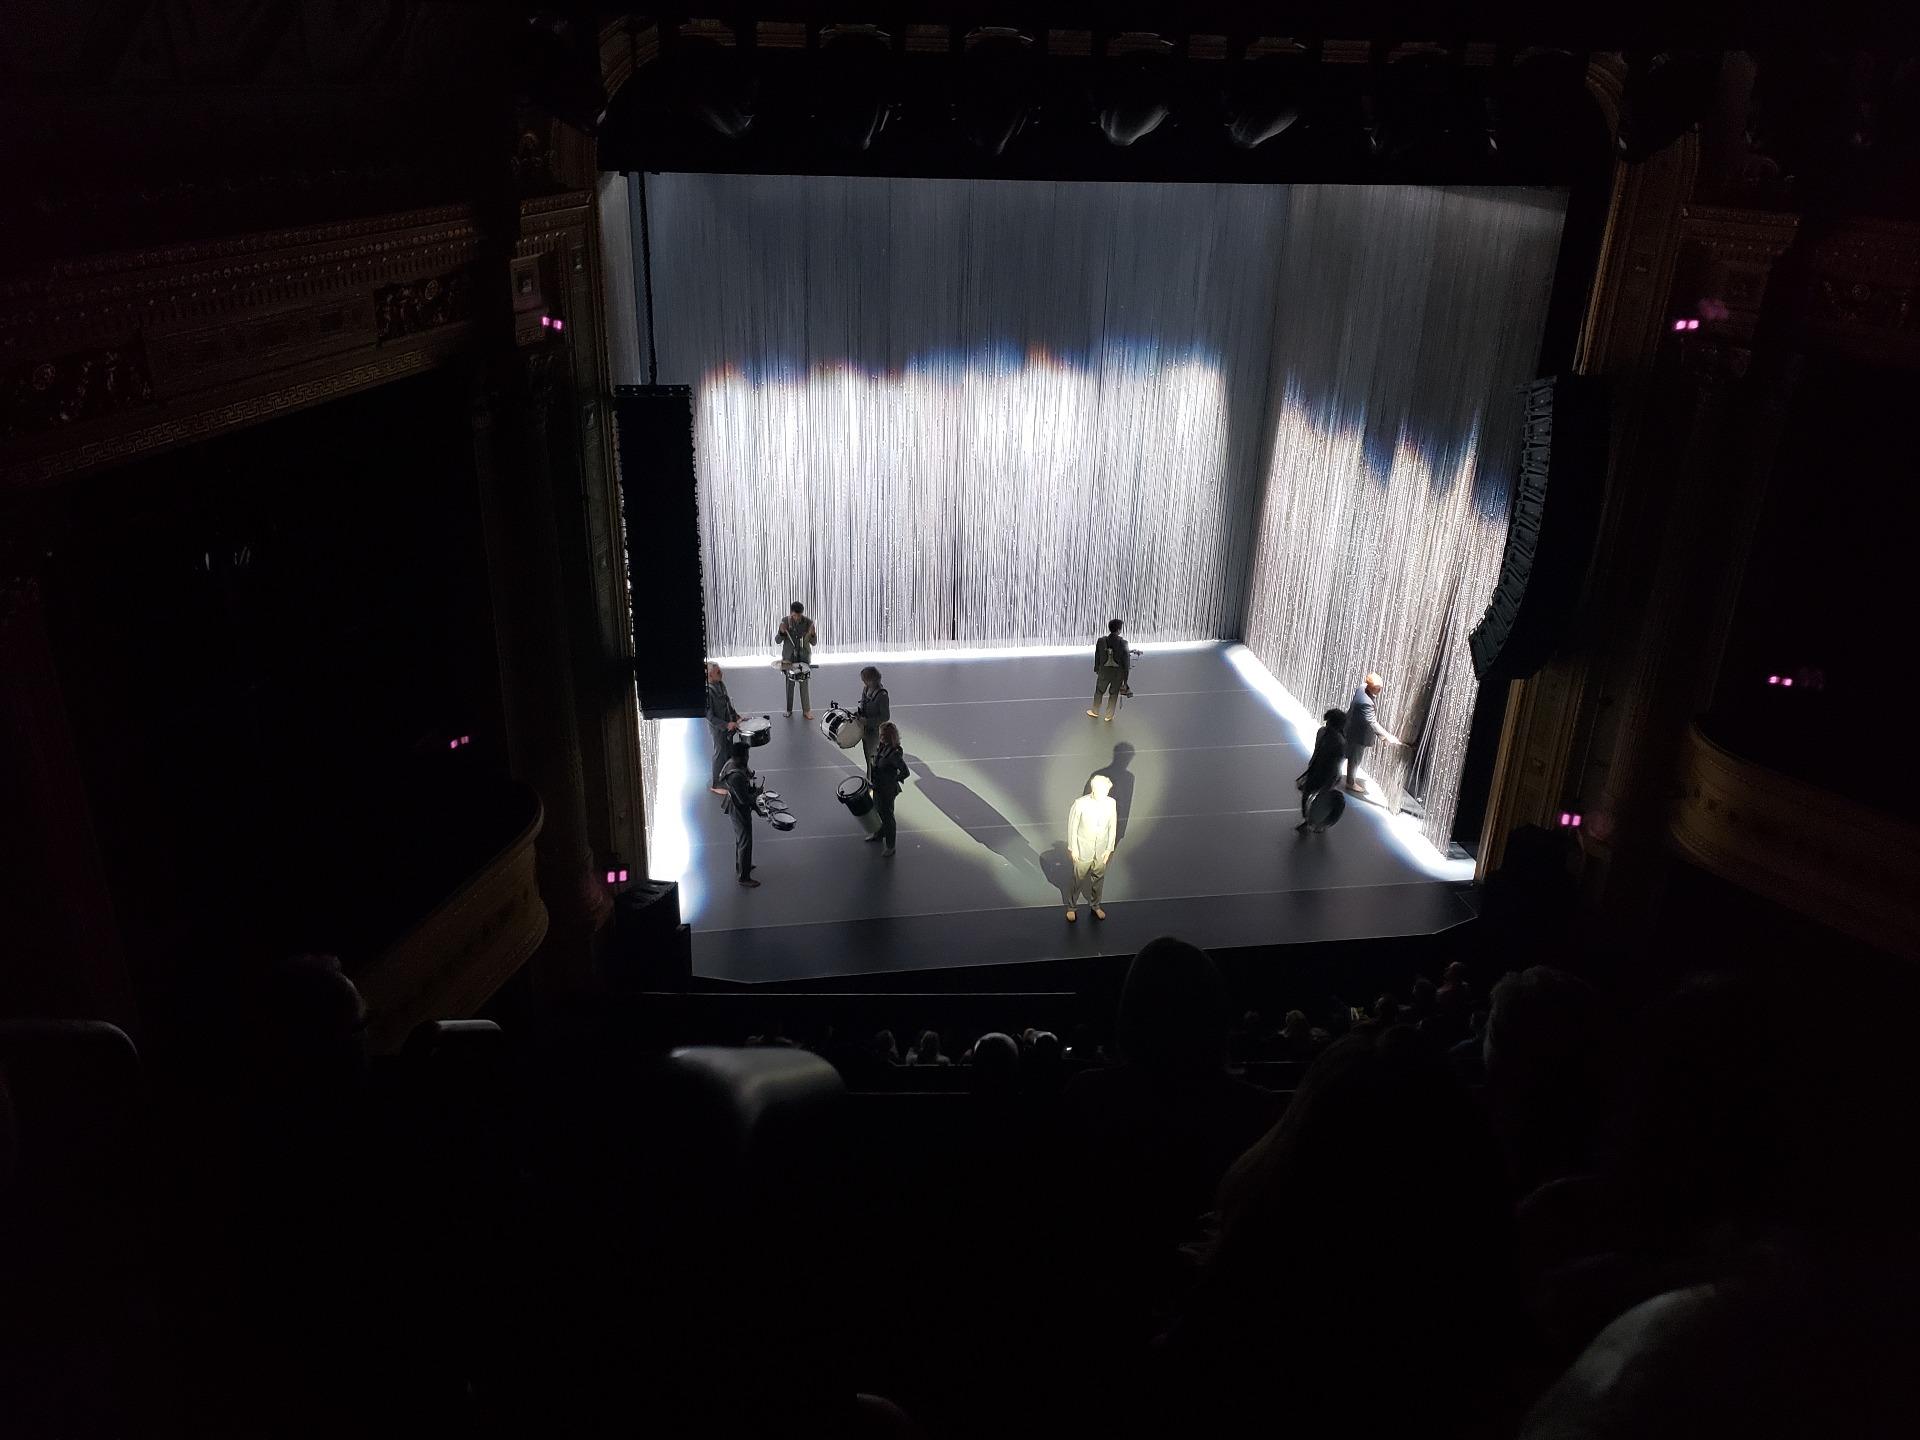 Hudson Theatre Section Balcony C Row D Seat 101